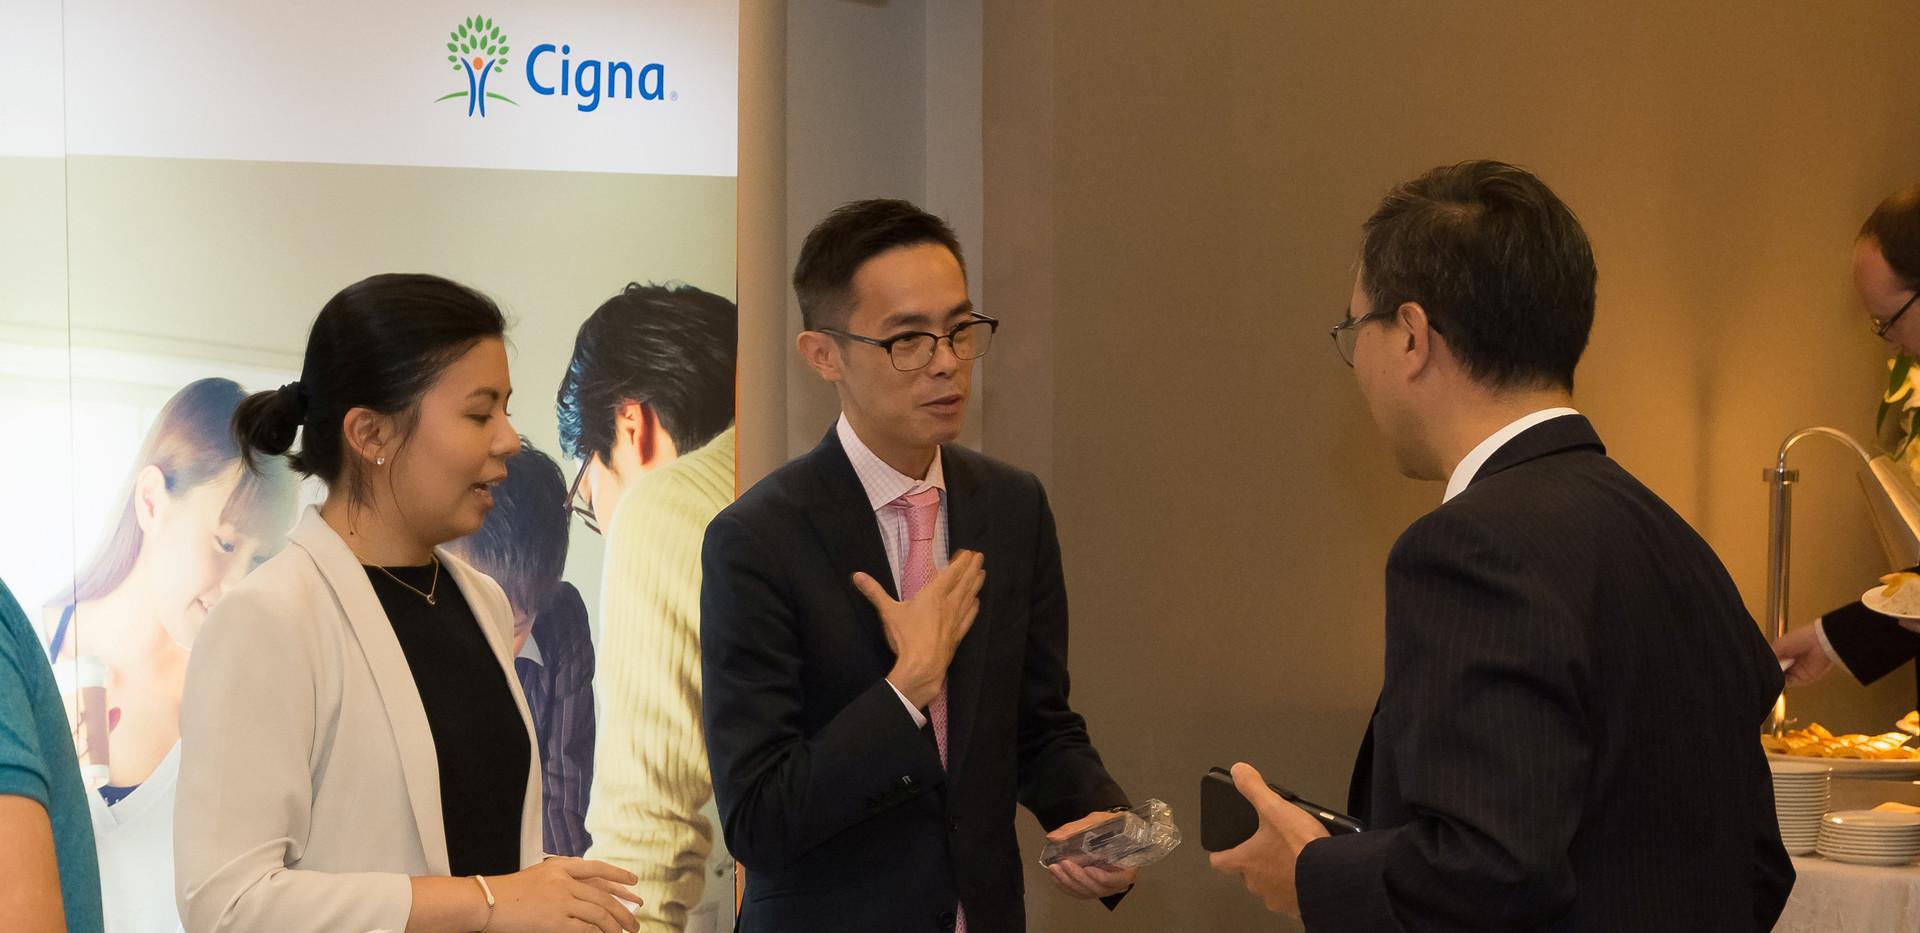 Sponsorship_Cigna Booth.jpg